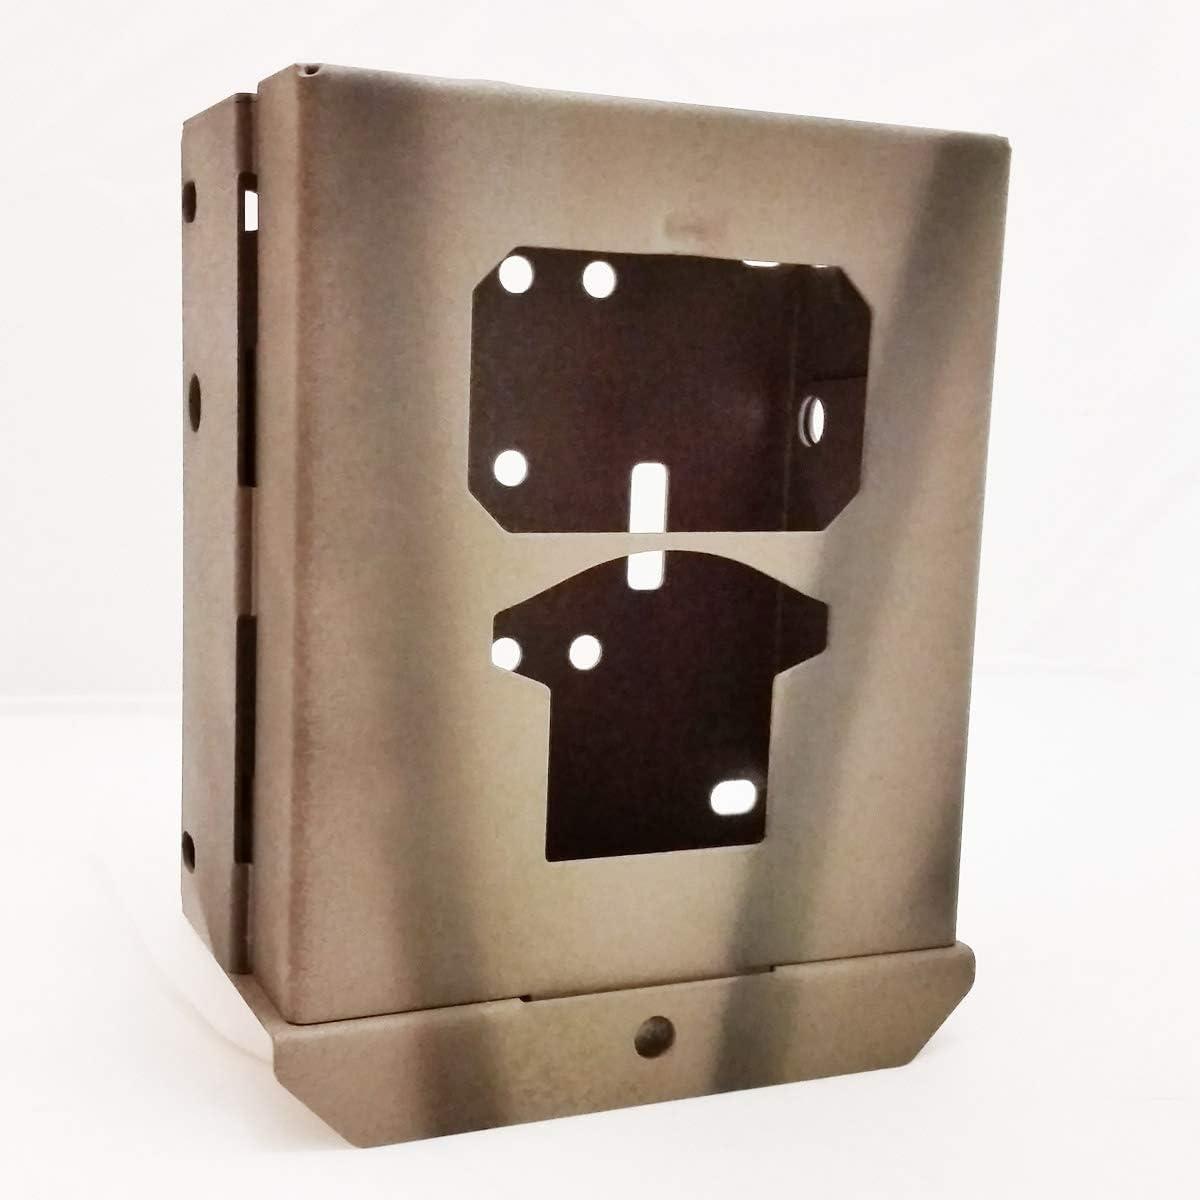 Camlockbox Compatible with HCO Spartan Go Cam Models in Description